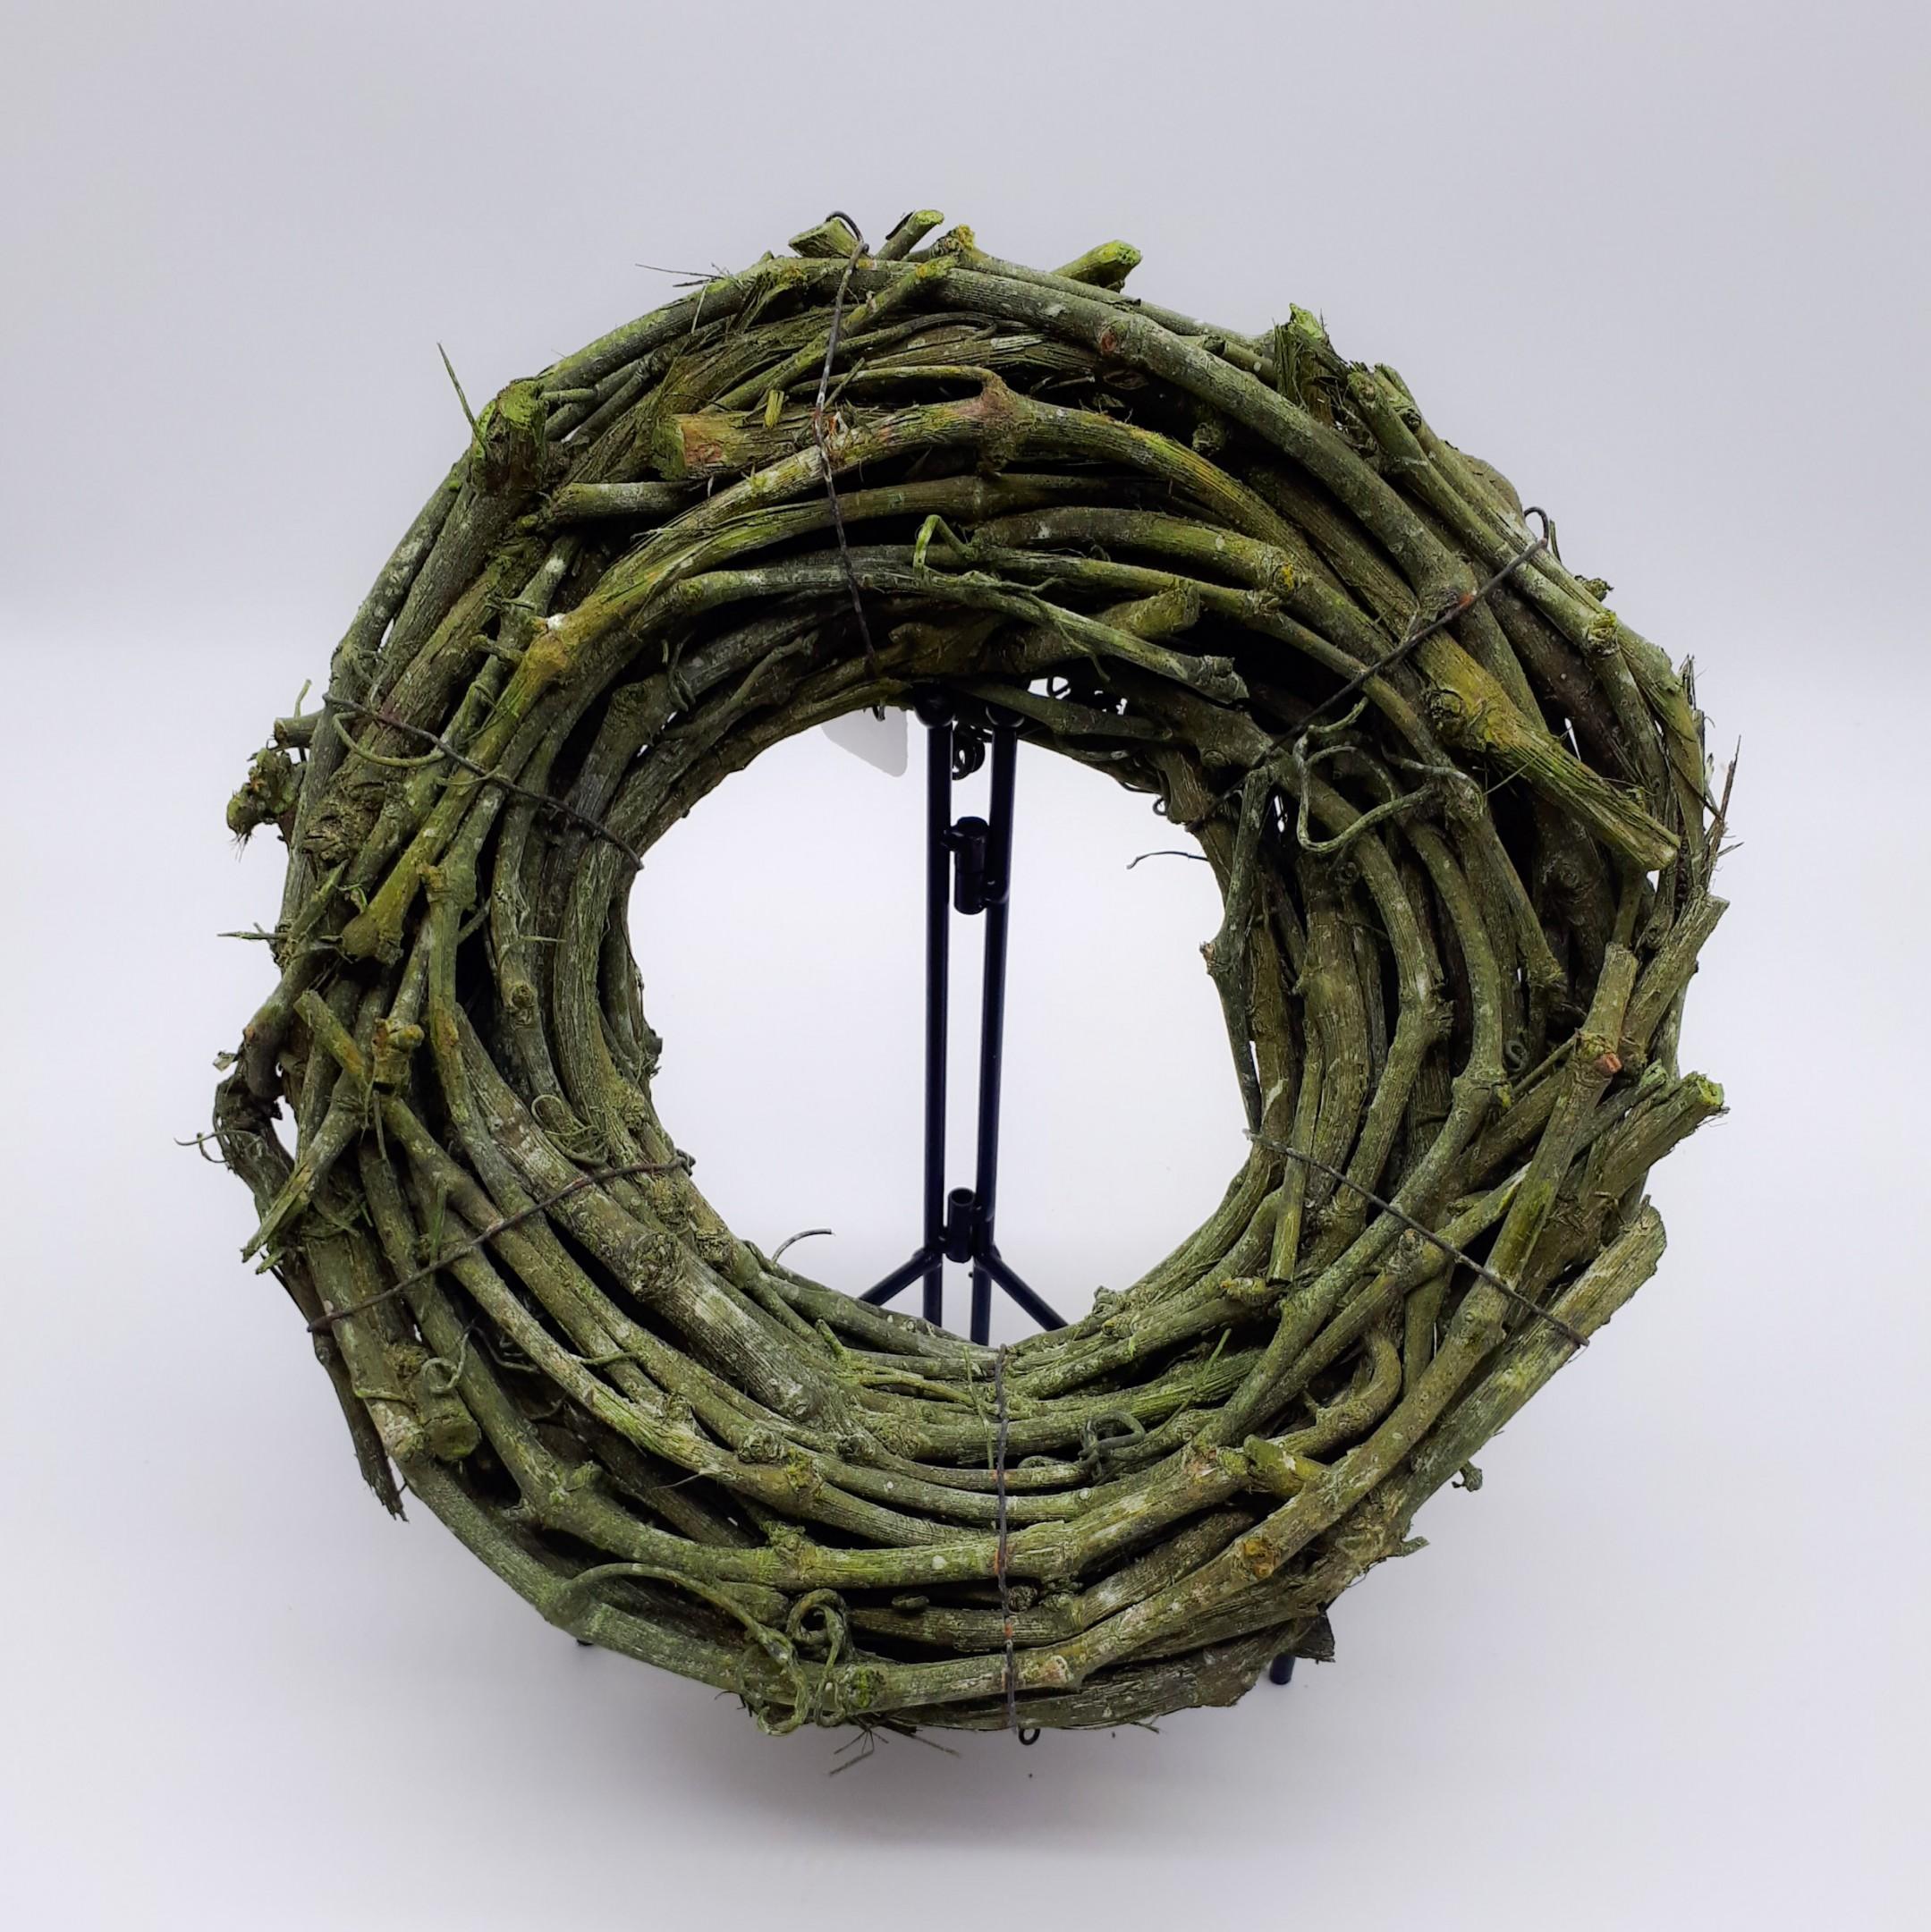 Rebkranz trocken olivgrün Bild 1